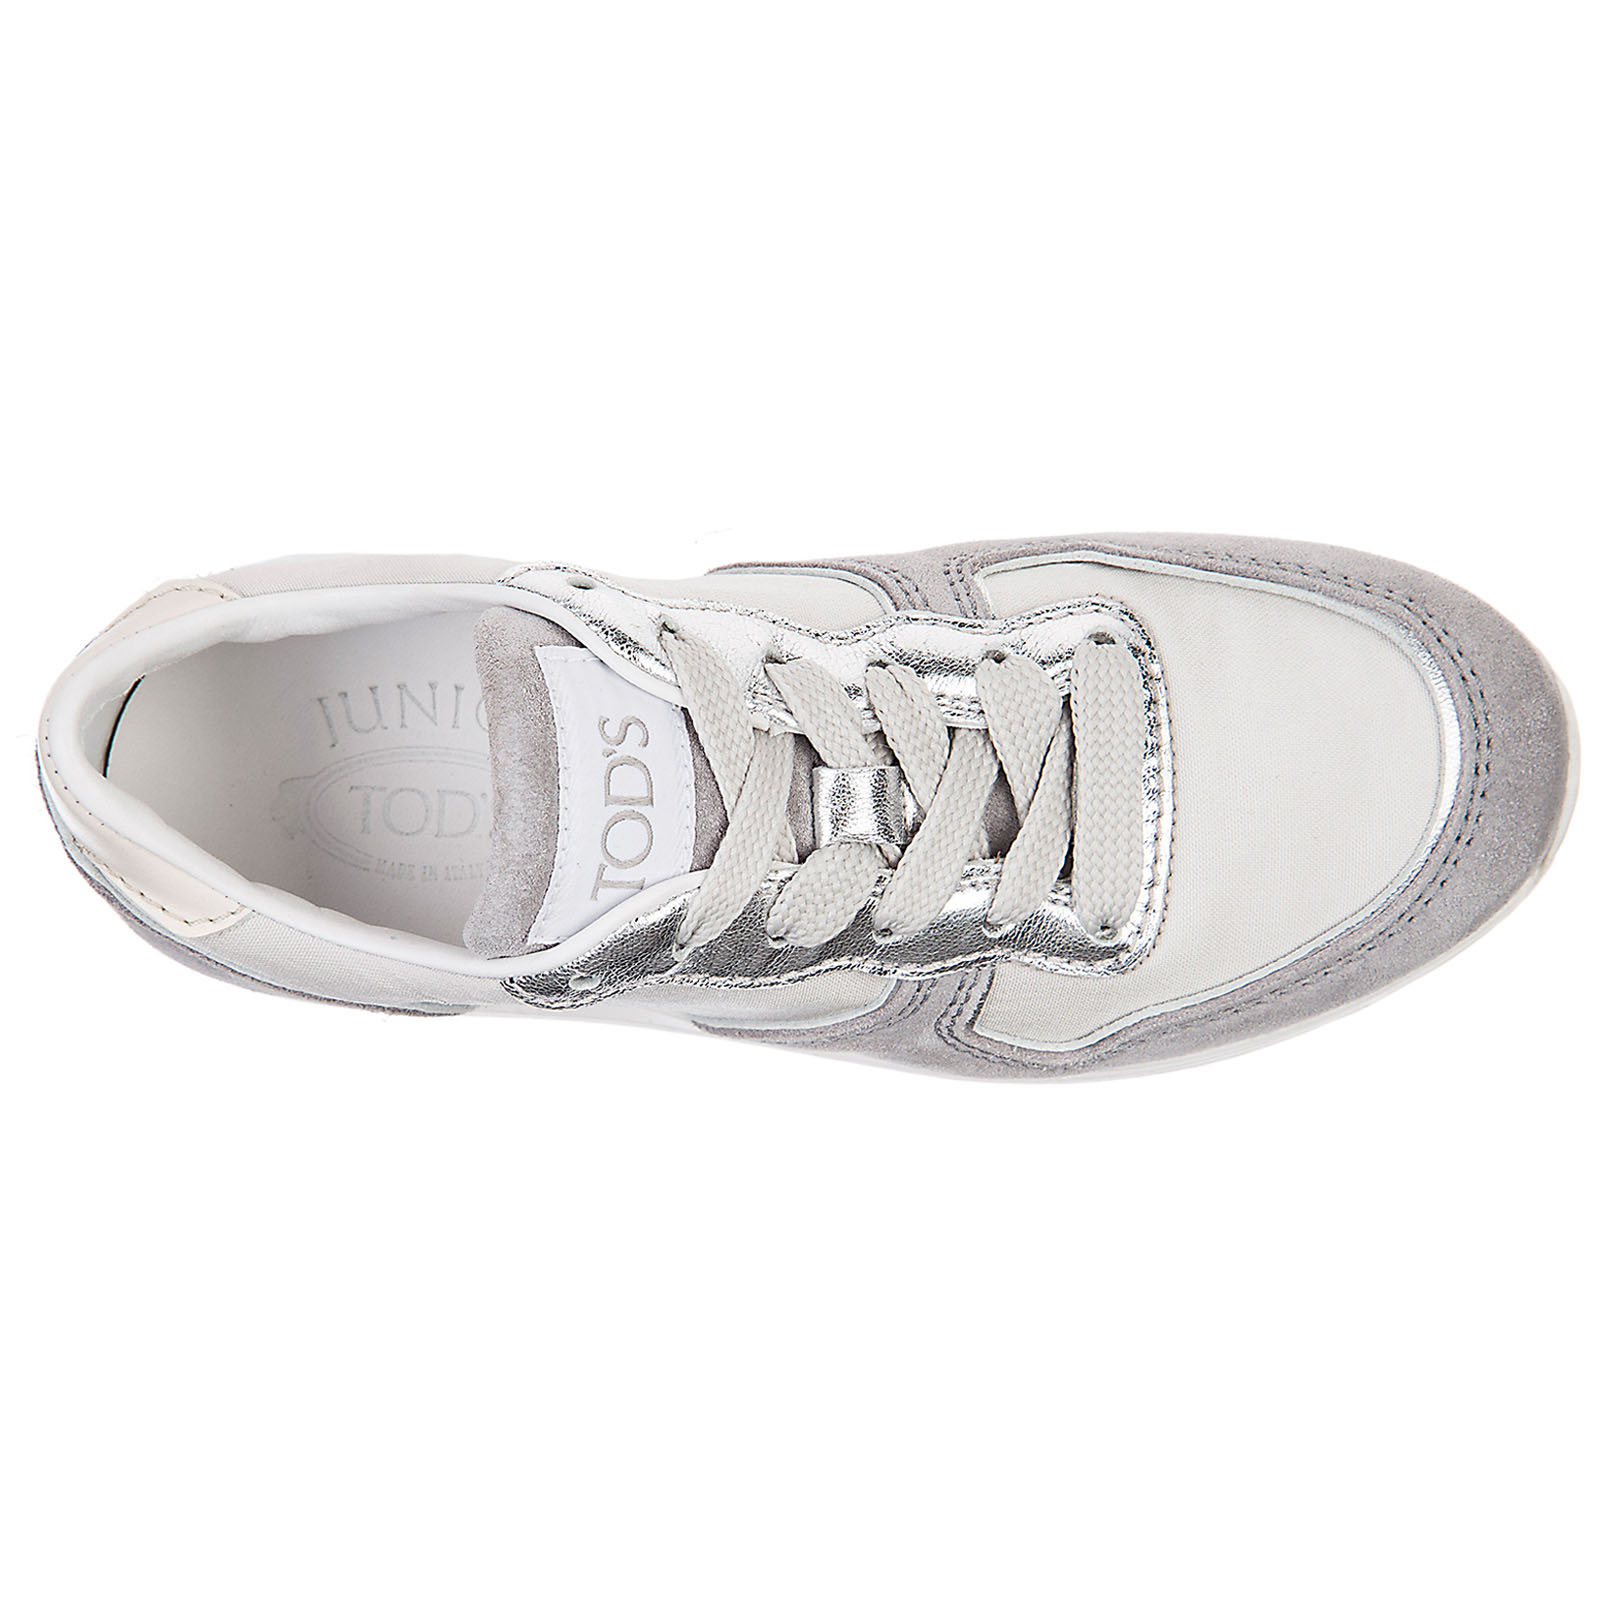 Sneakers kinder schuhe jungen kinderschuhe wildleder running